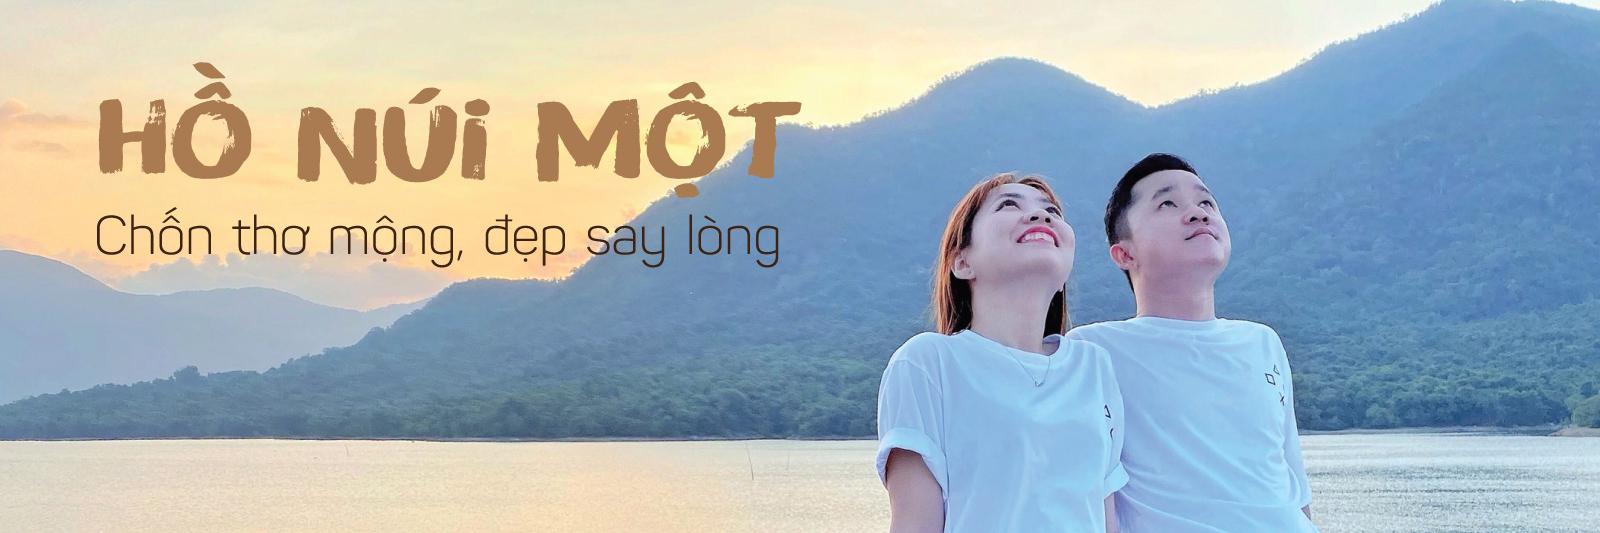 https://gody.vn/blog/maikakool7858/post/review-ho-nui-mot-chon-tho-mong-dep-say-long-khi-den-binh-dinh-8543